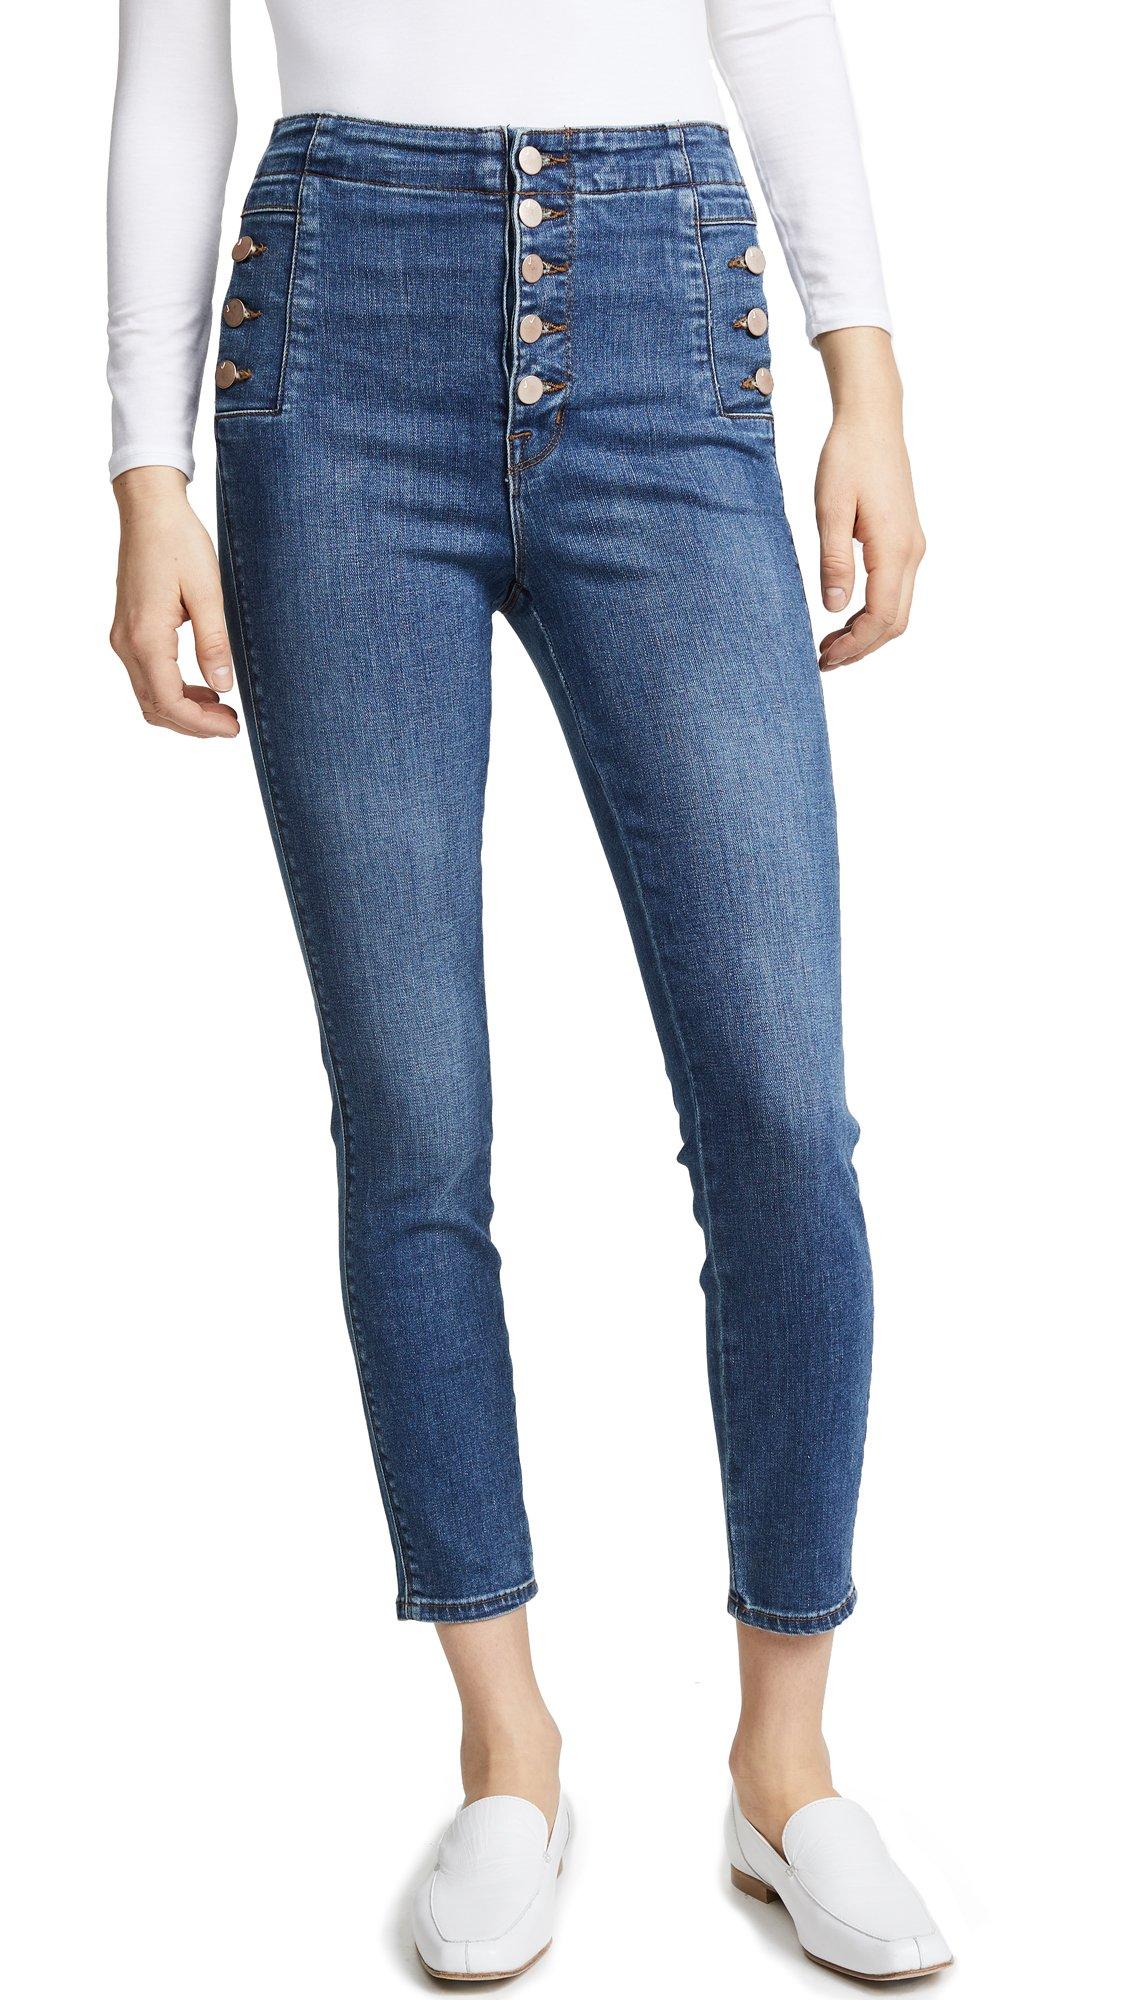 J Brand Women's Natasha Sky High Cropped Skinny Jeans, Lovesick, 31